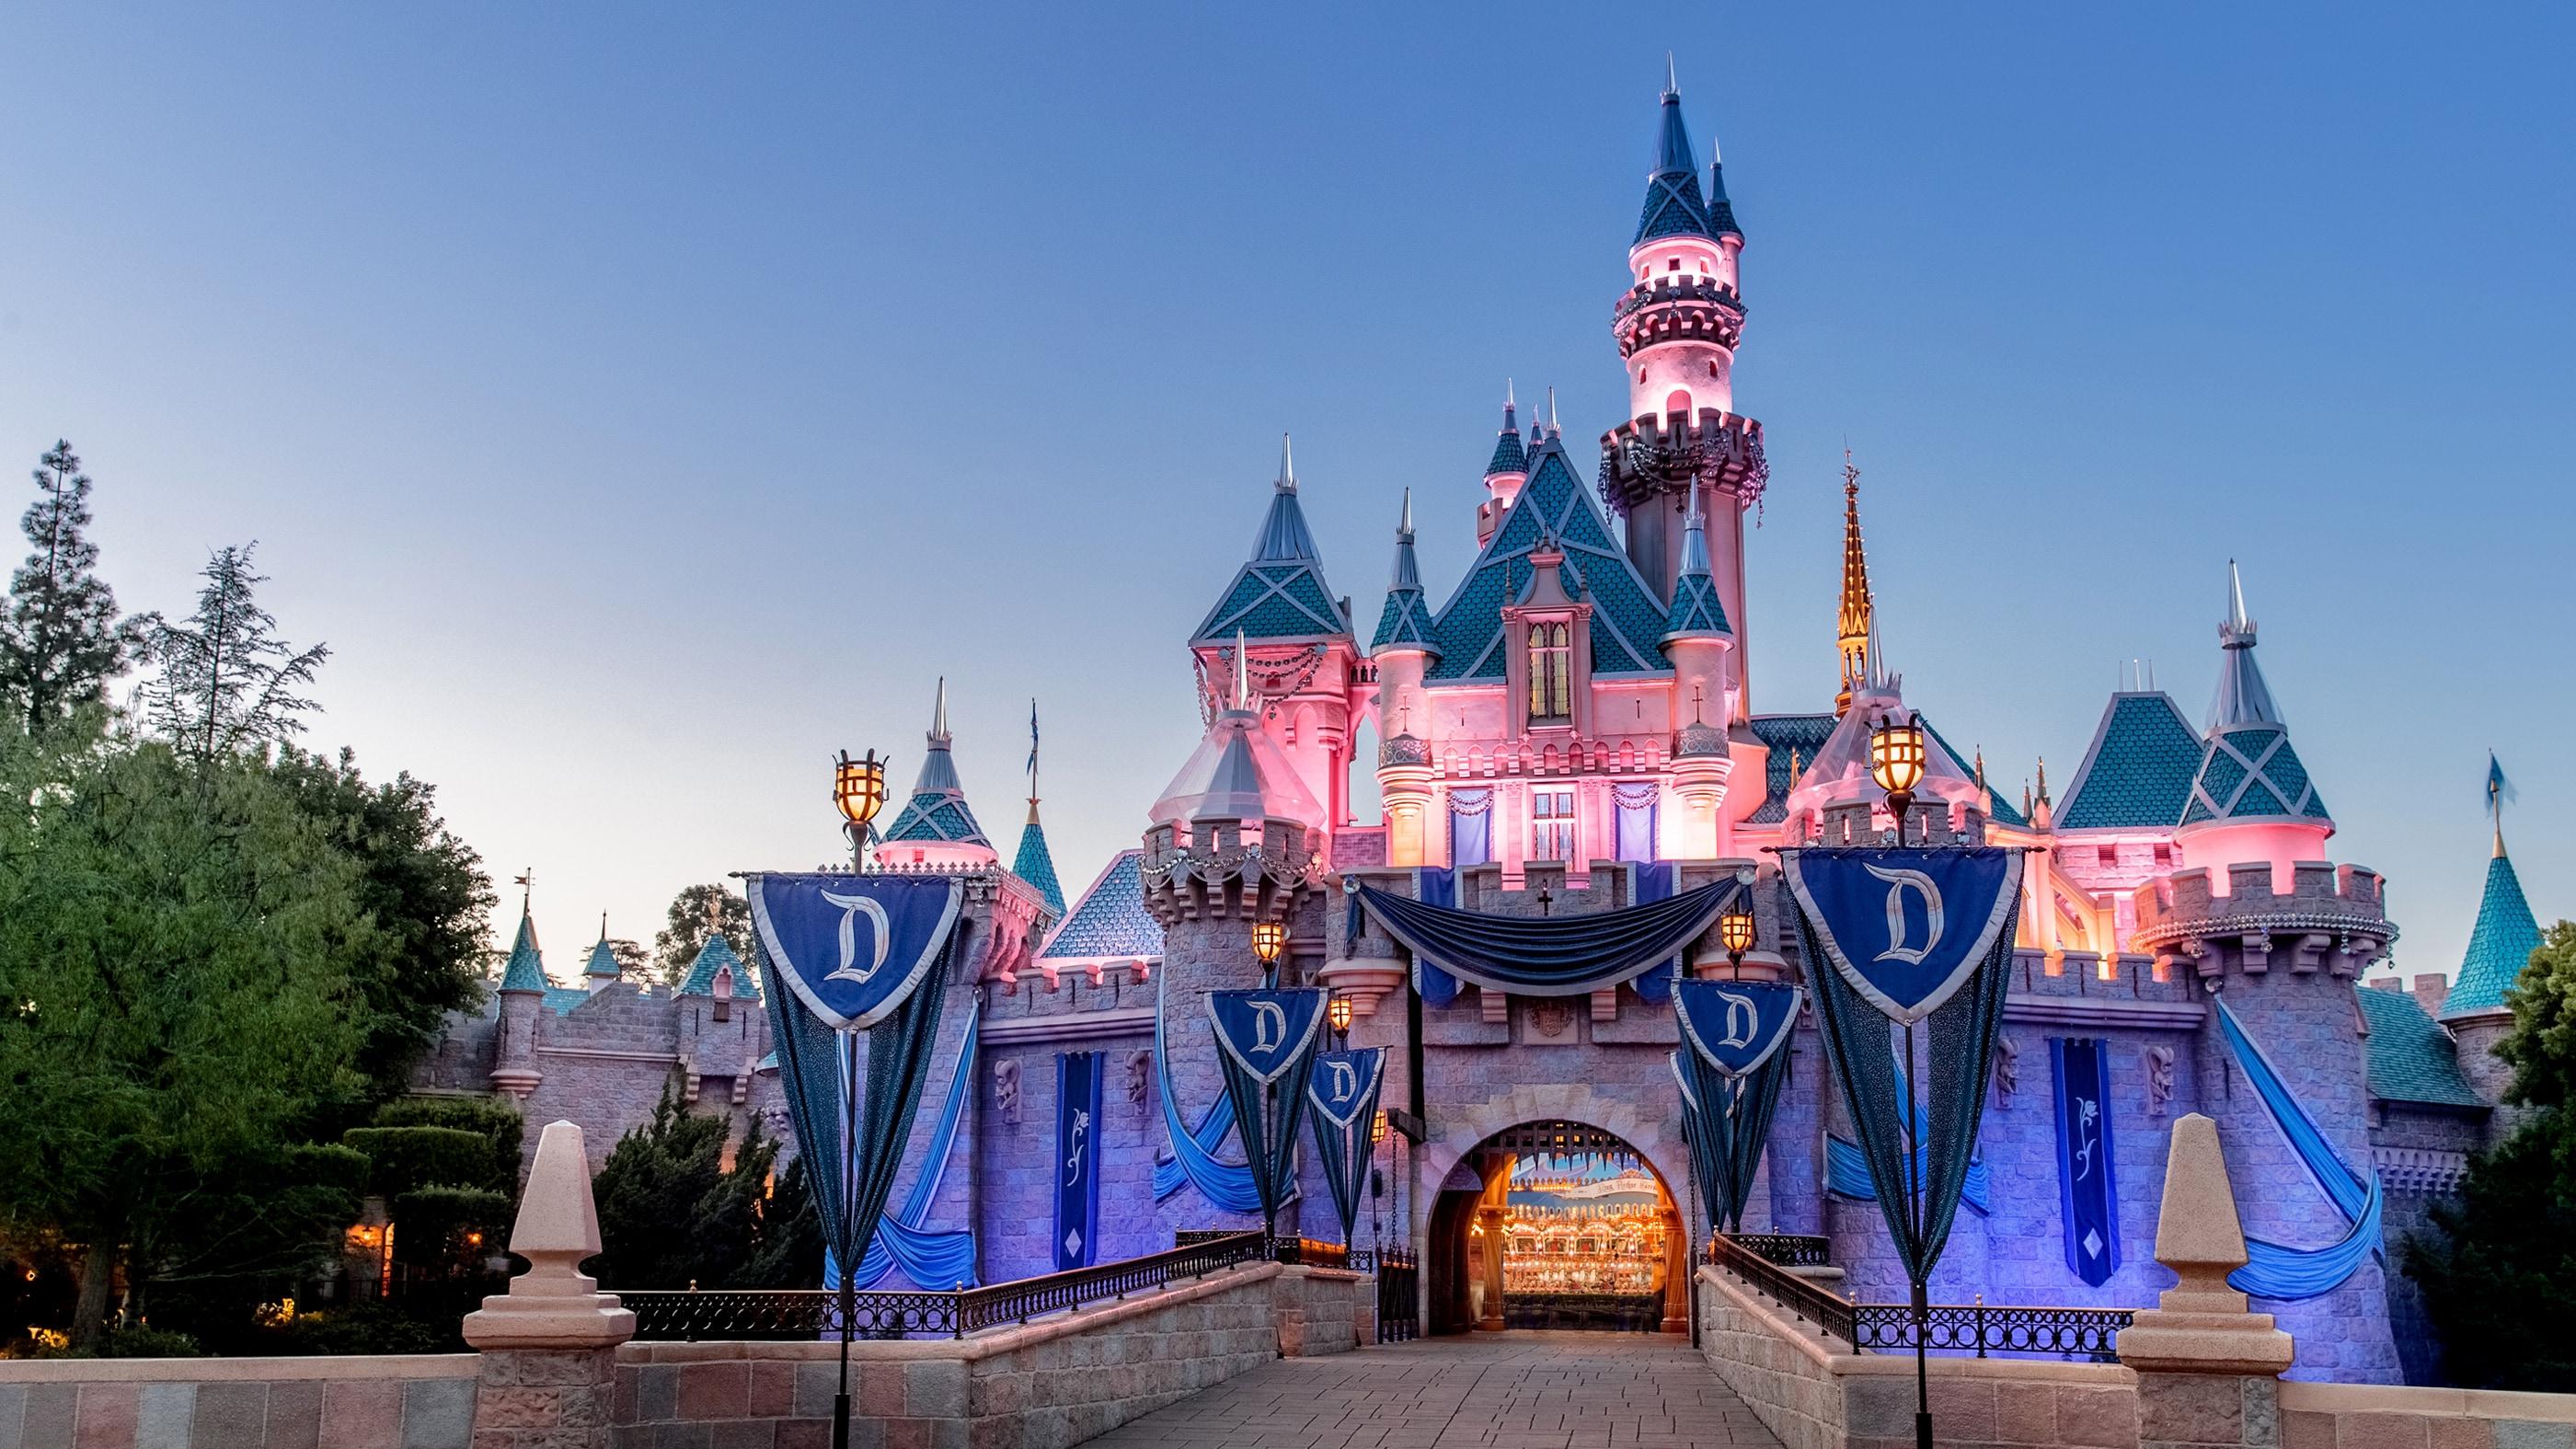 Sleeping Beauty Castle at Disneyland Park, illuminated in the evening